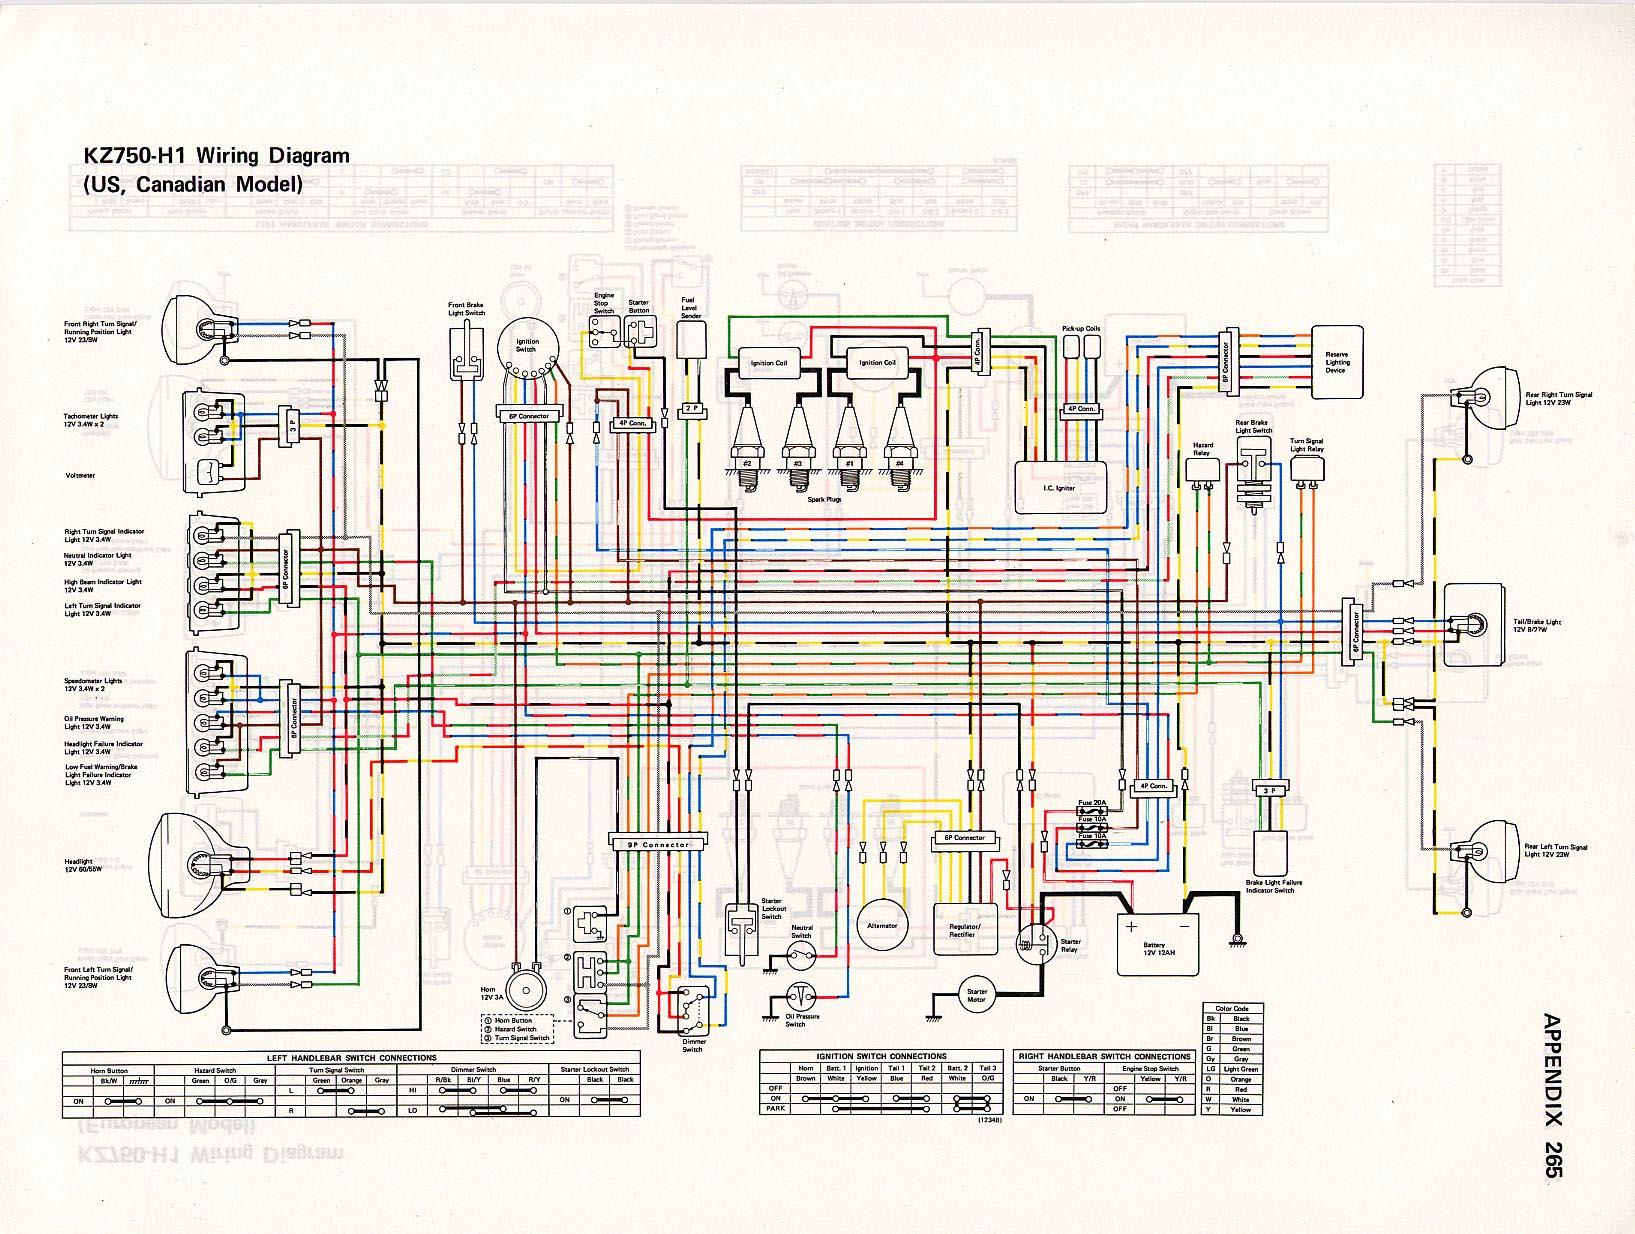 Groovy H1 Wiring Diagram Wiring Diagram Database Wiring Cloud Loplapiotaidewilluminateatxorg